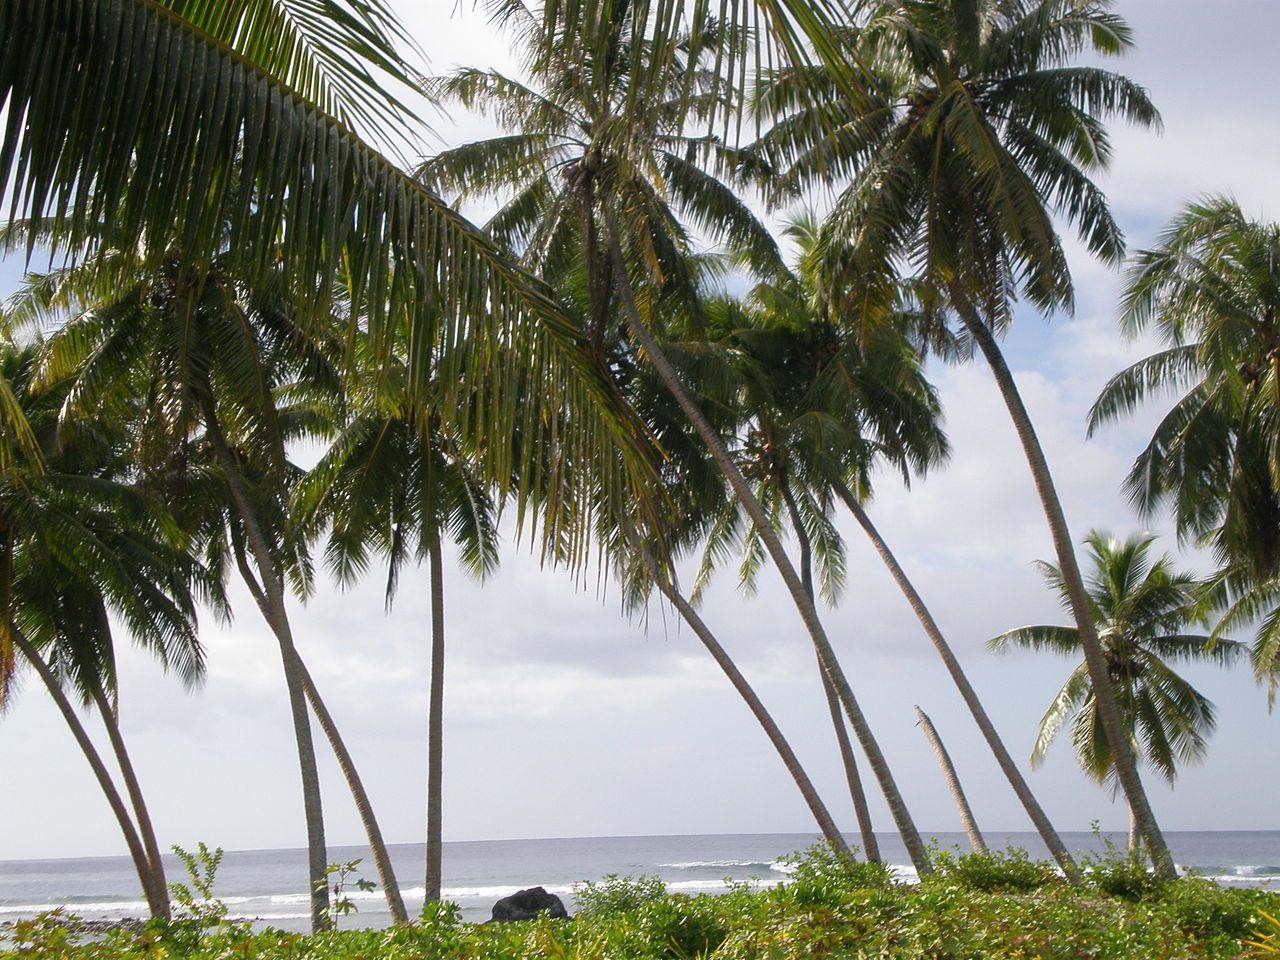 Samoan Coconut Tree | Файл:Coconut trees by the sea,